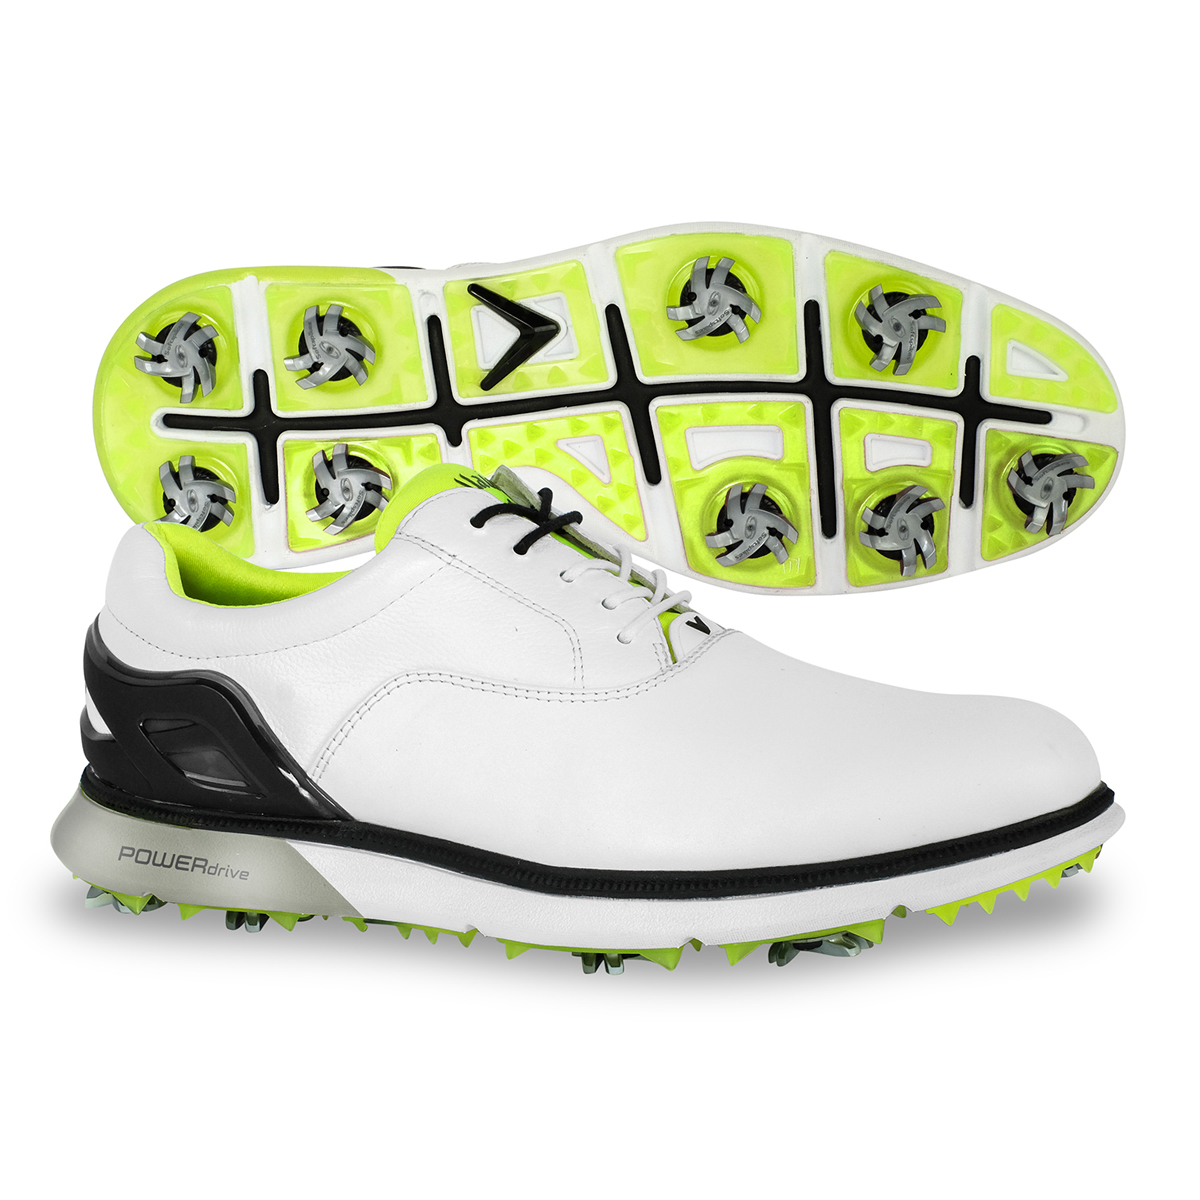 cf18eeeb359f2 Details about Callaway Men's LaGrange Golf Shoes